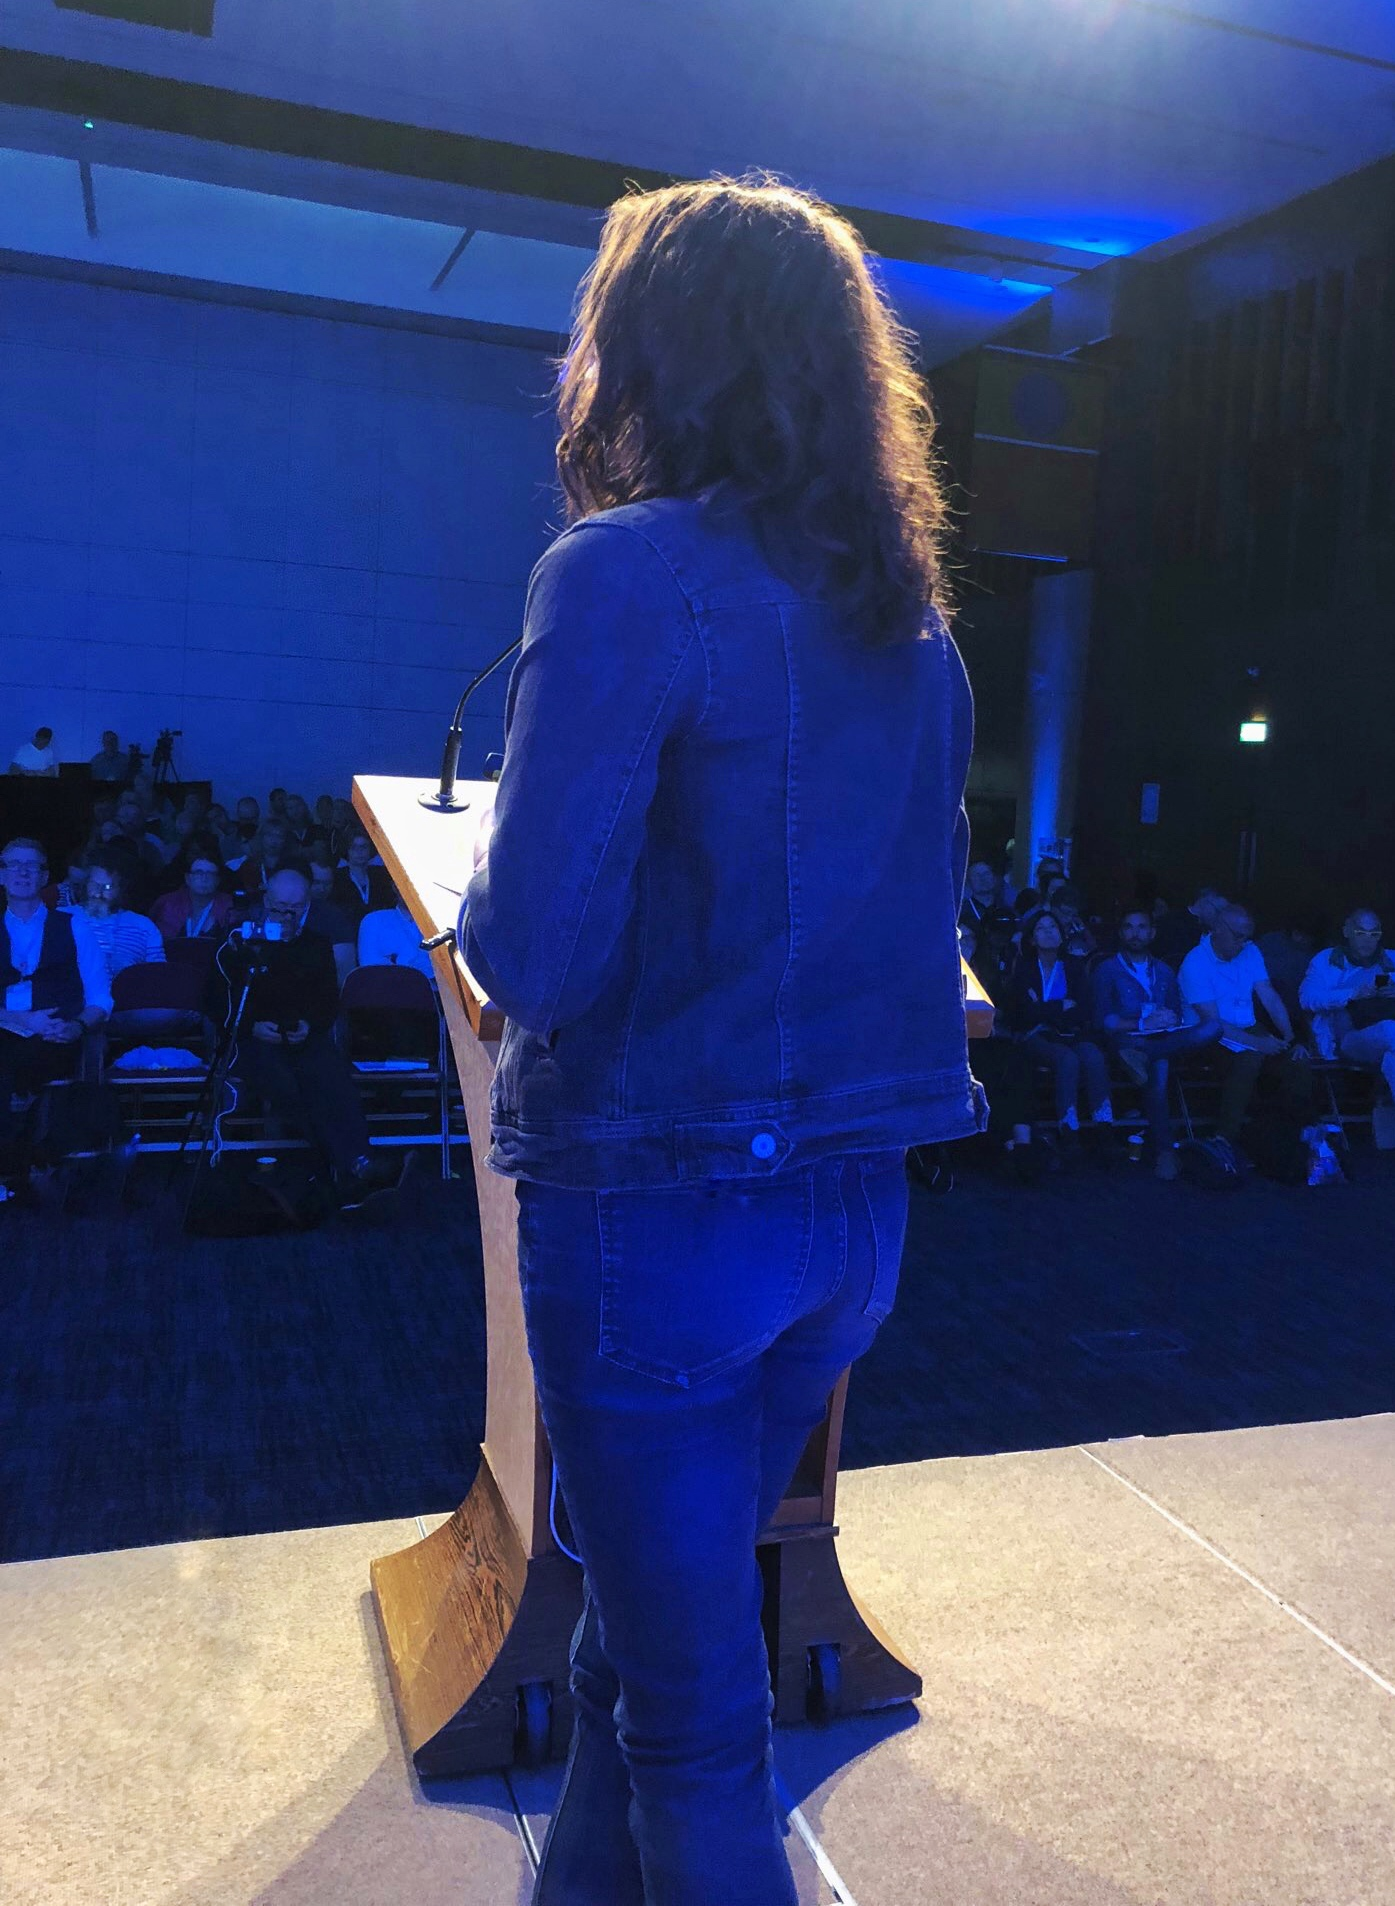 Photo from the stage, by Sarah Jones @virtuallysarahj